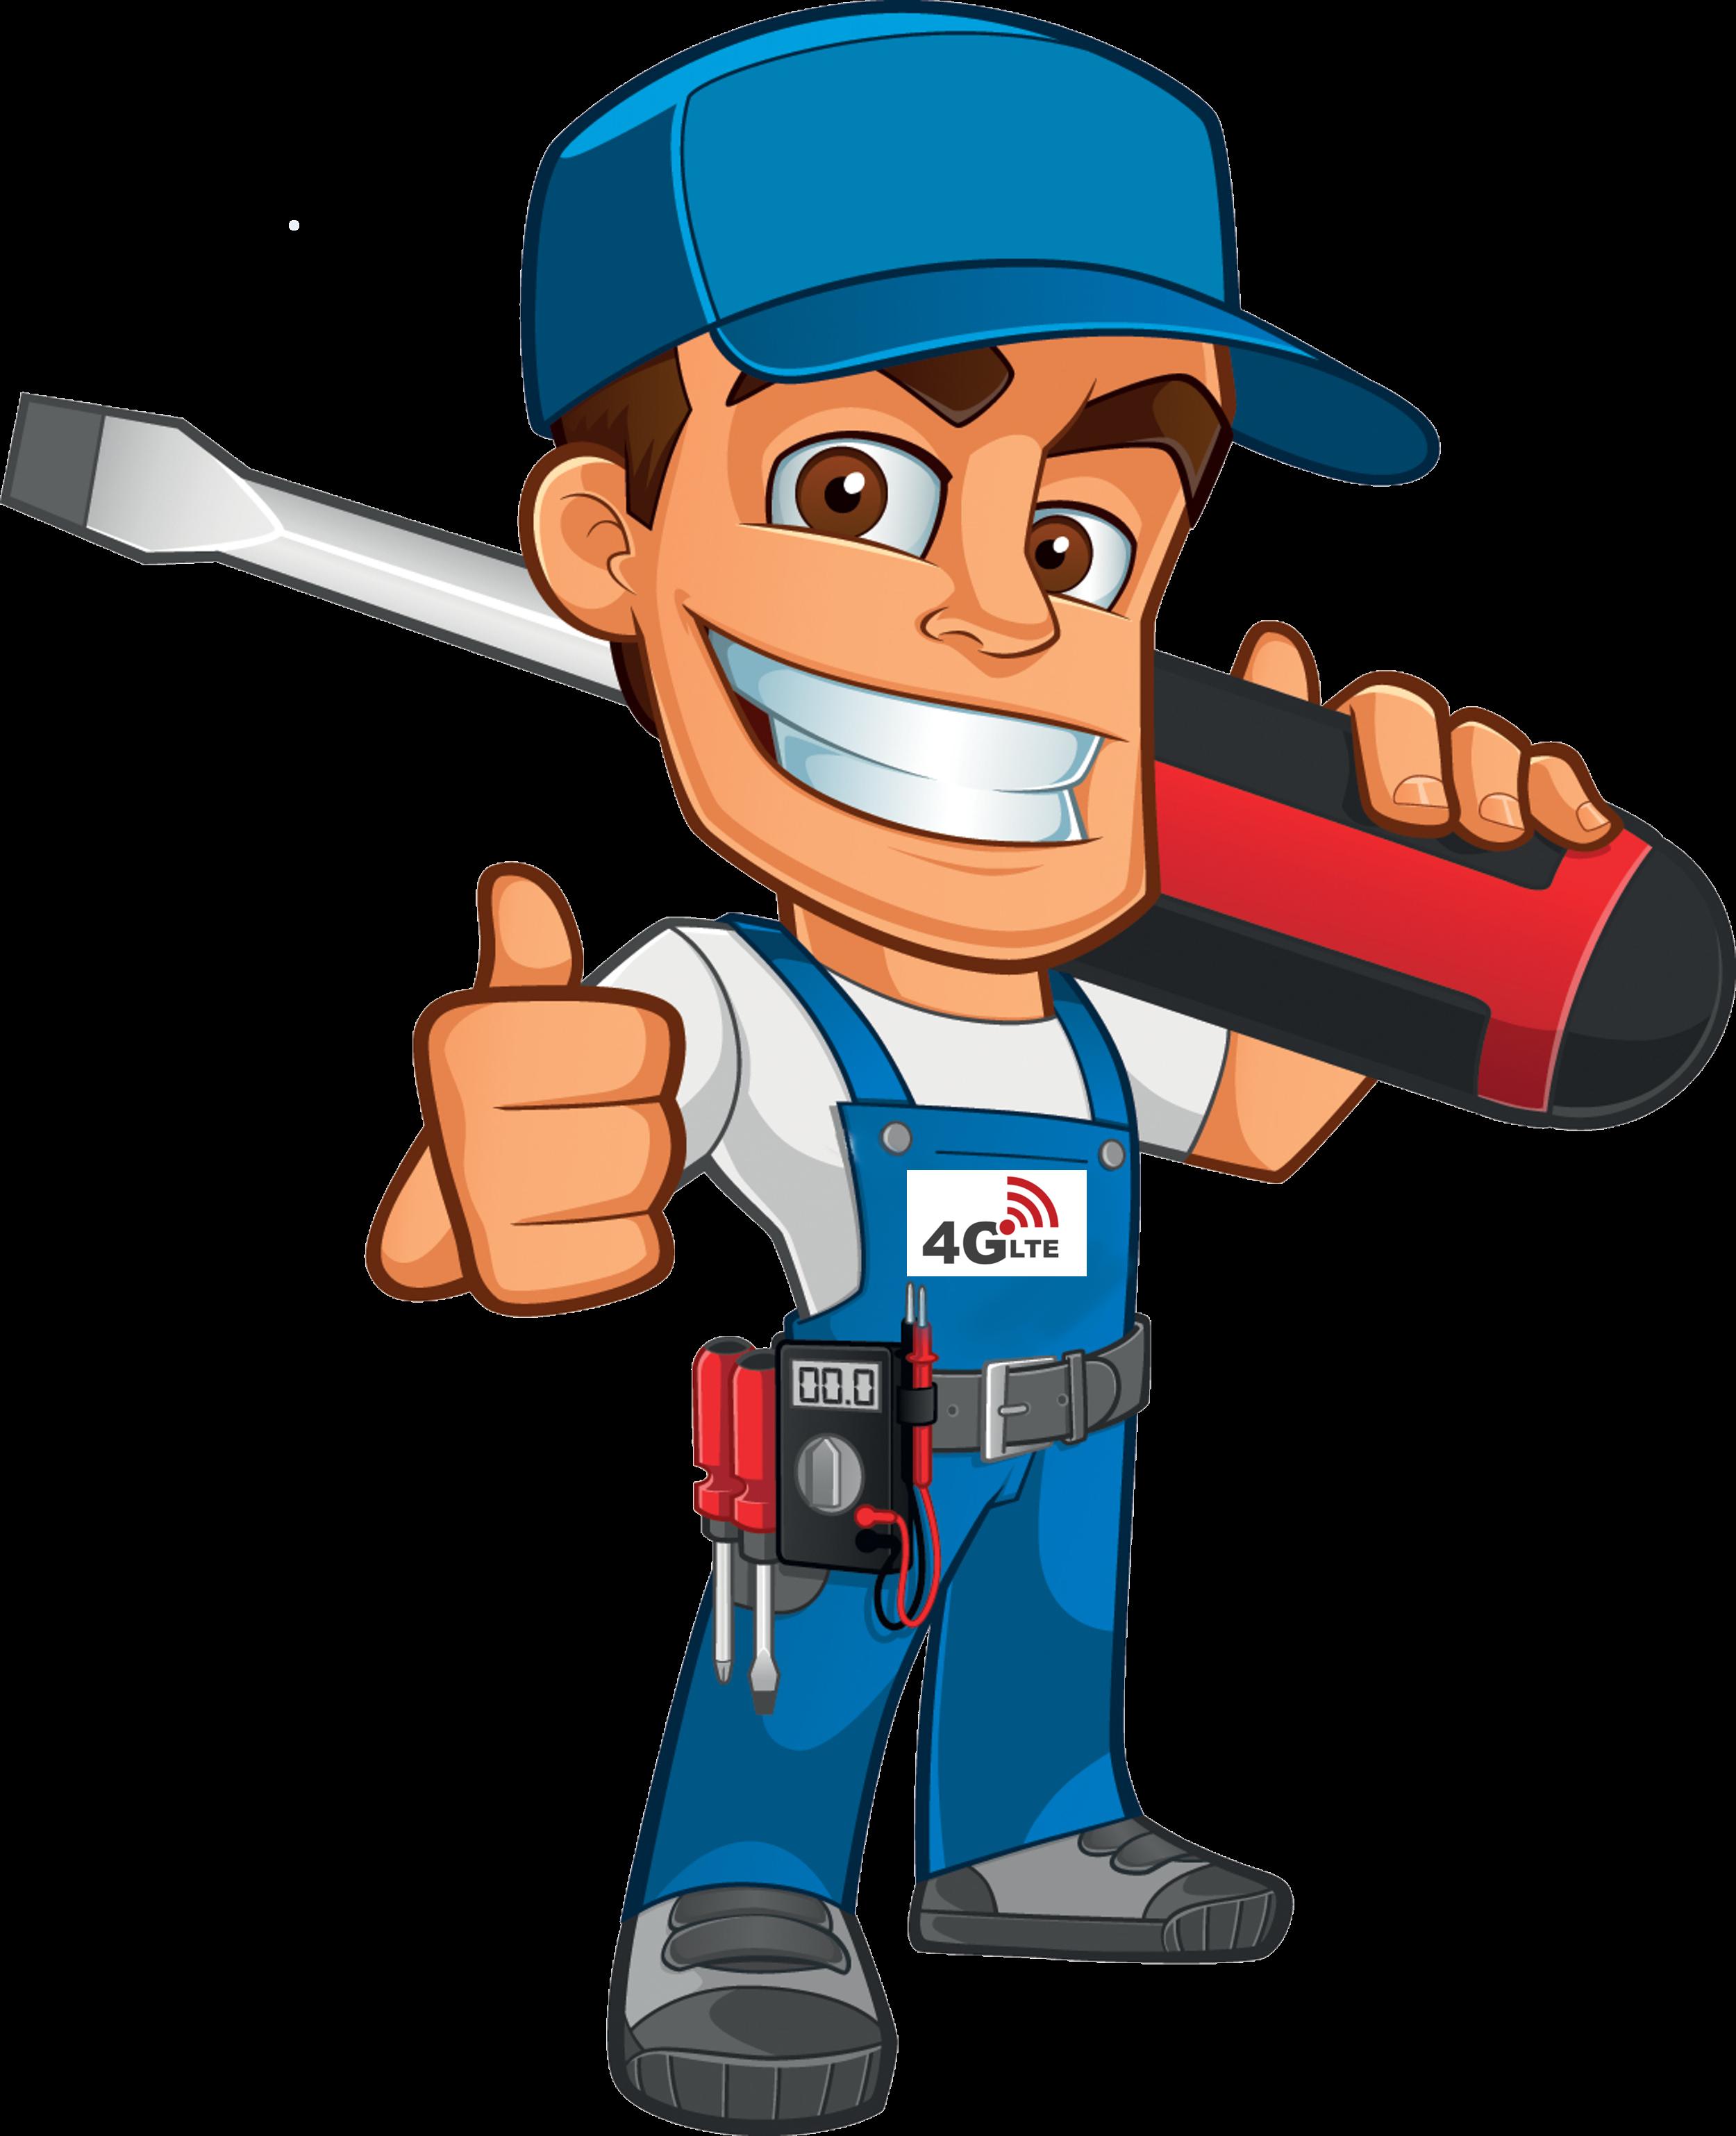 Handyman clipart repair man, Handyman repair man Transparent.